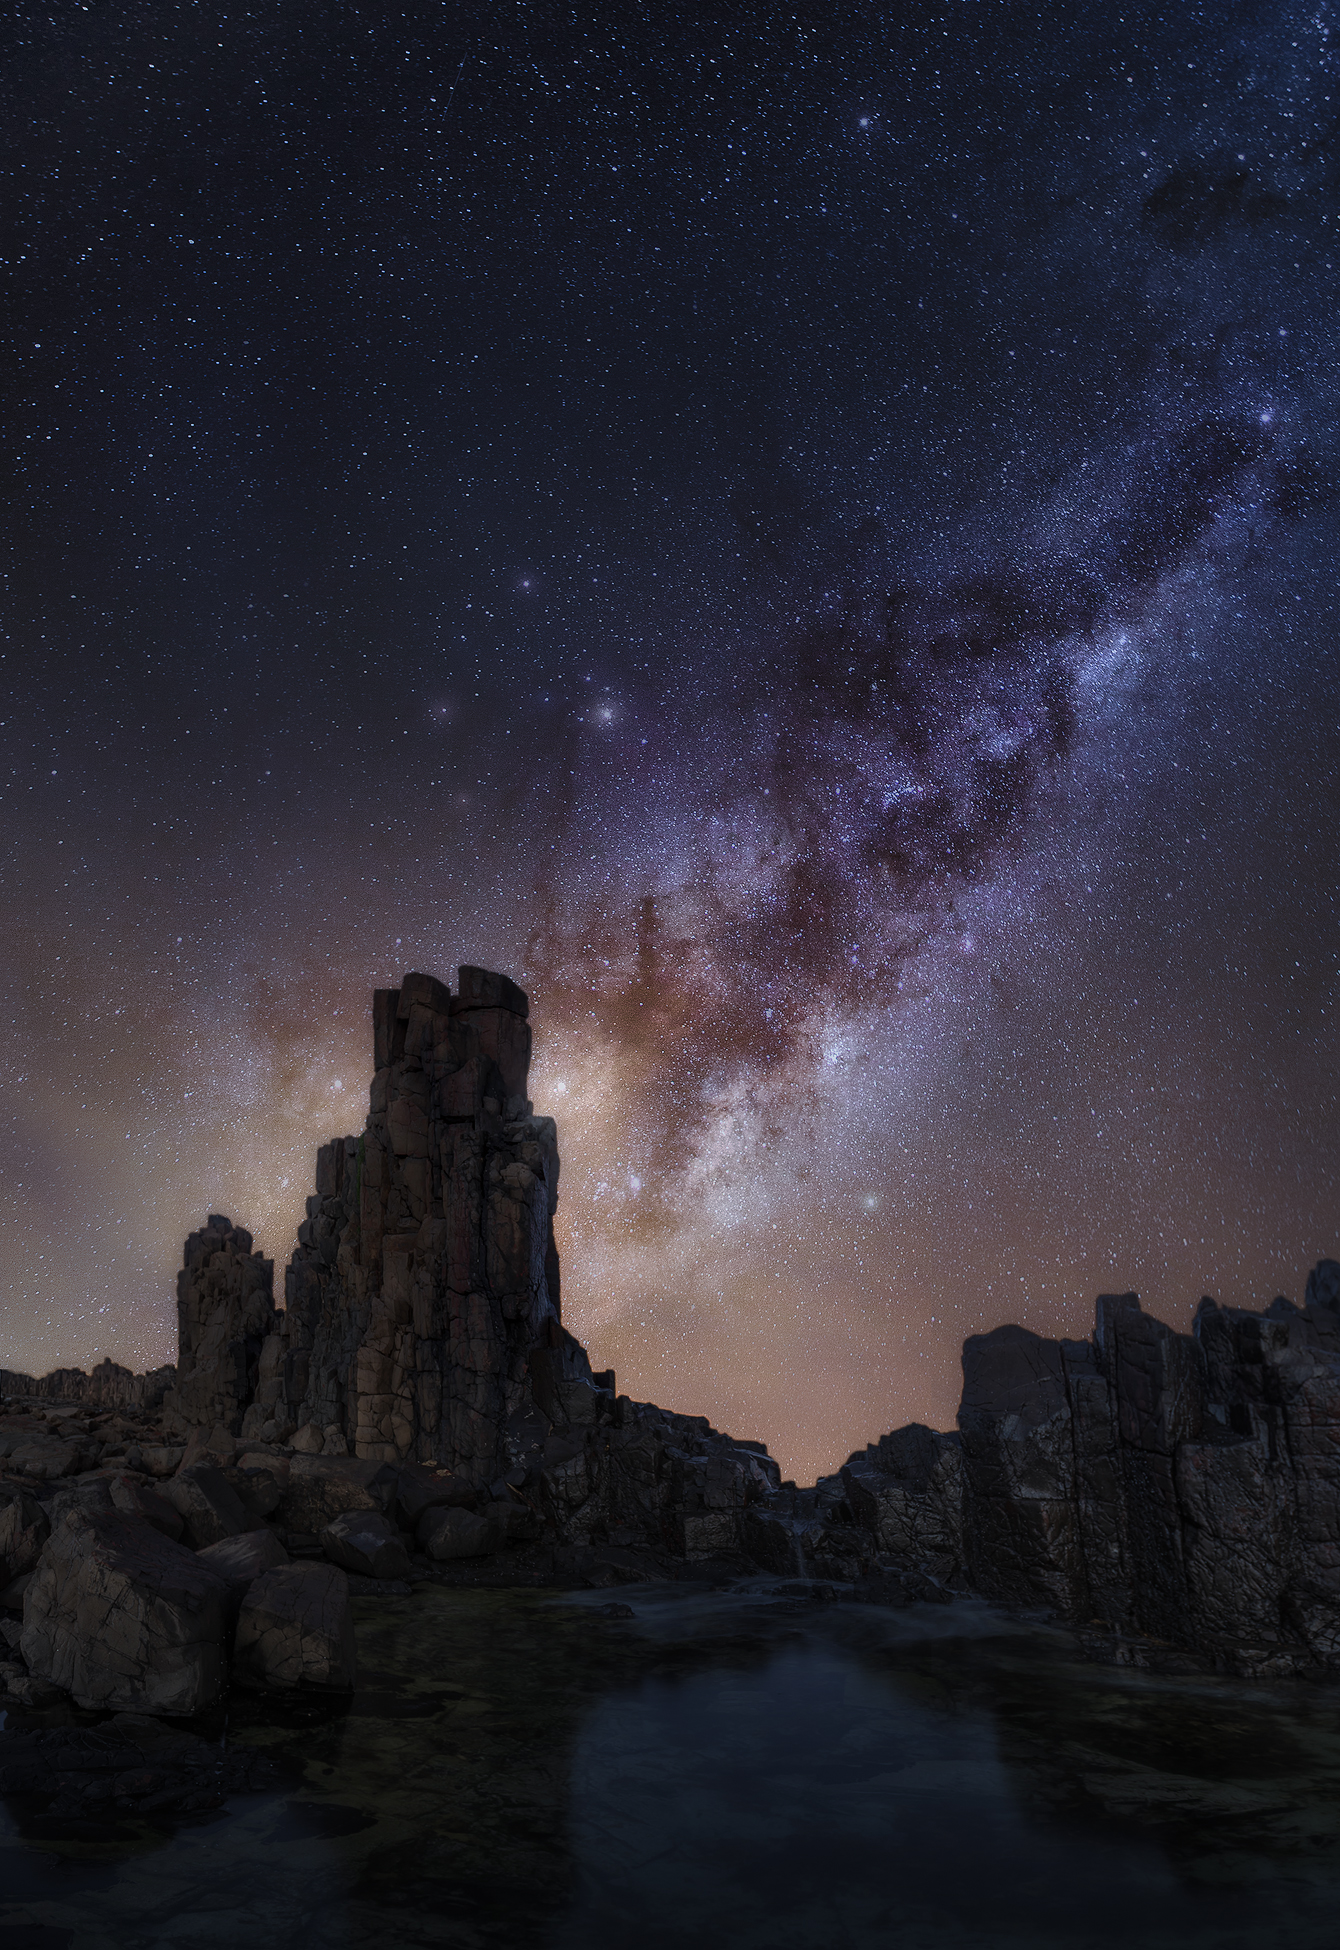 Stargazing at Bombo Quarry, Kiama, NSW | We Are Raw Photography Tours